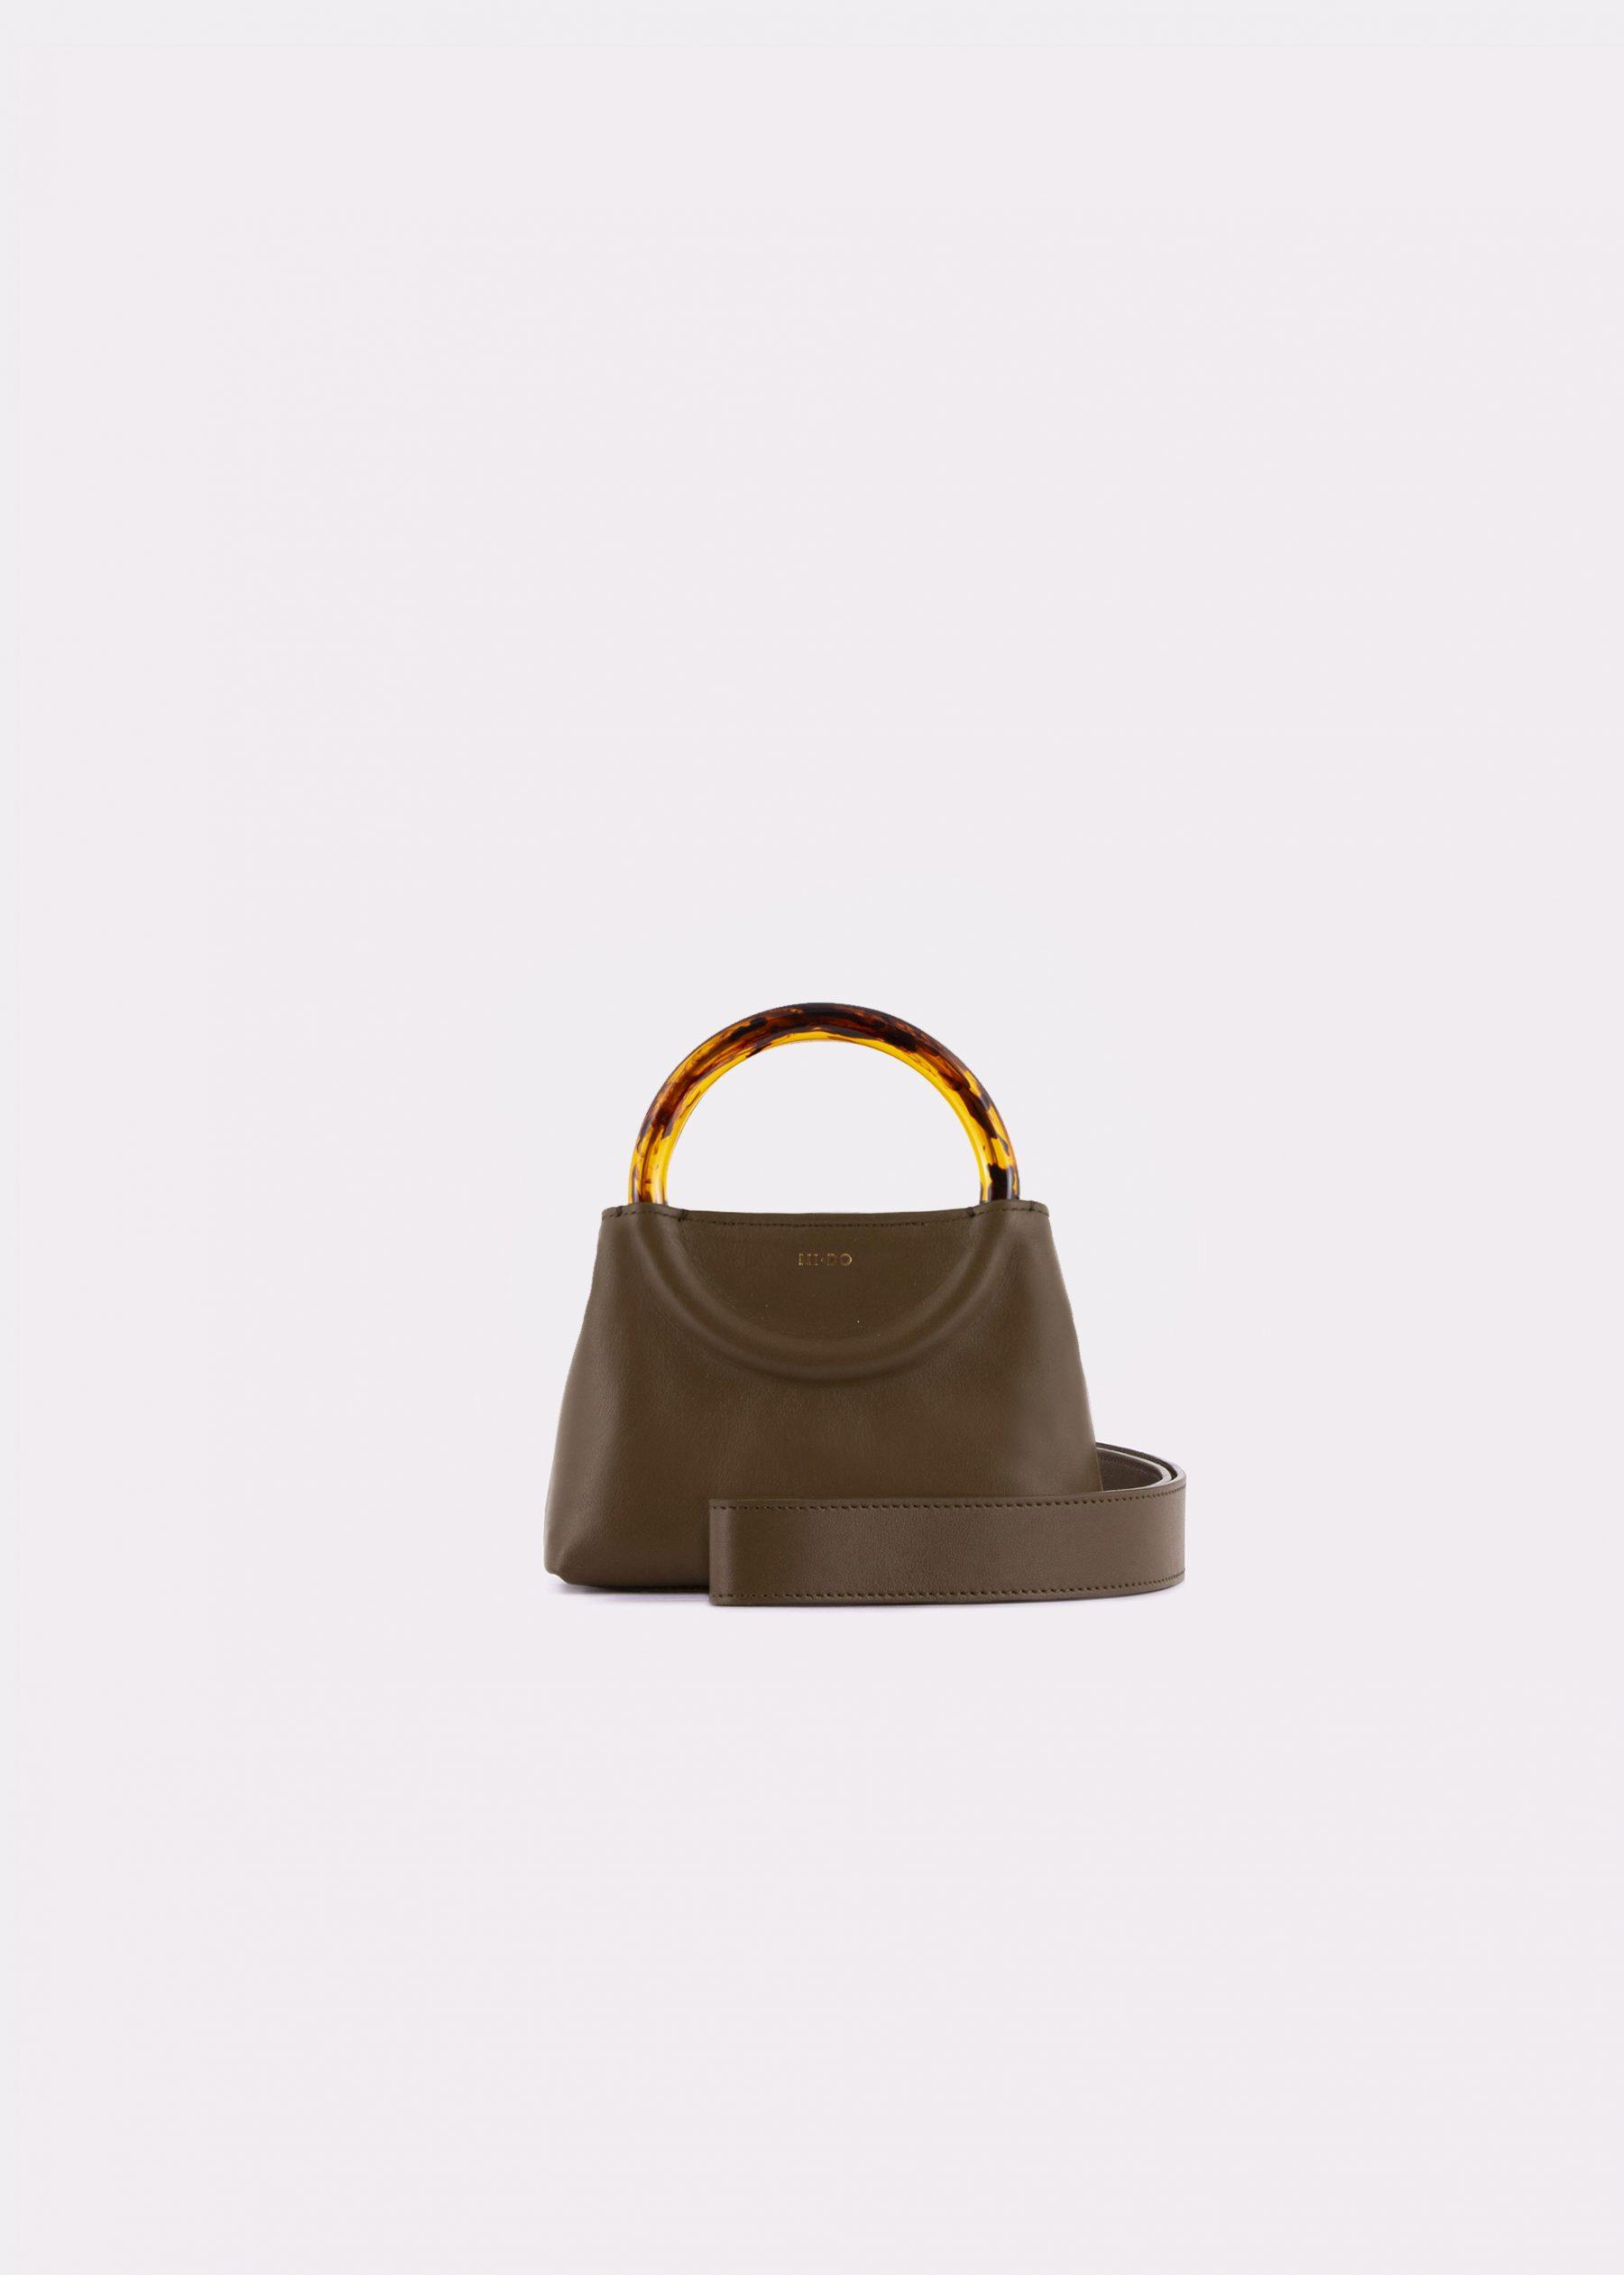 NIDO Bolla_Micro bag olive_shoulderstrap view